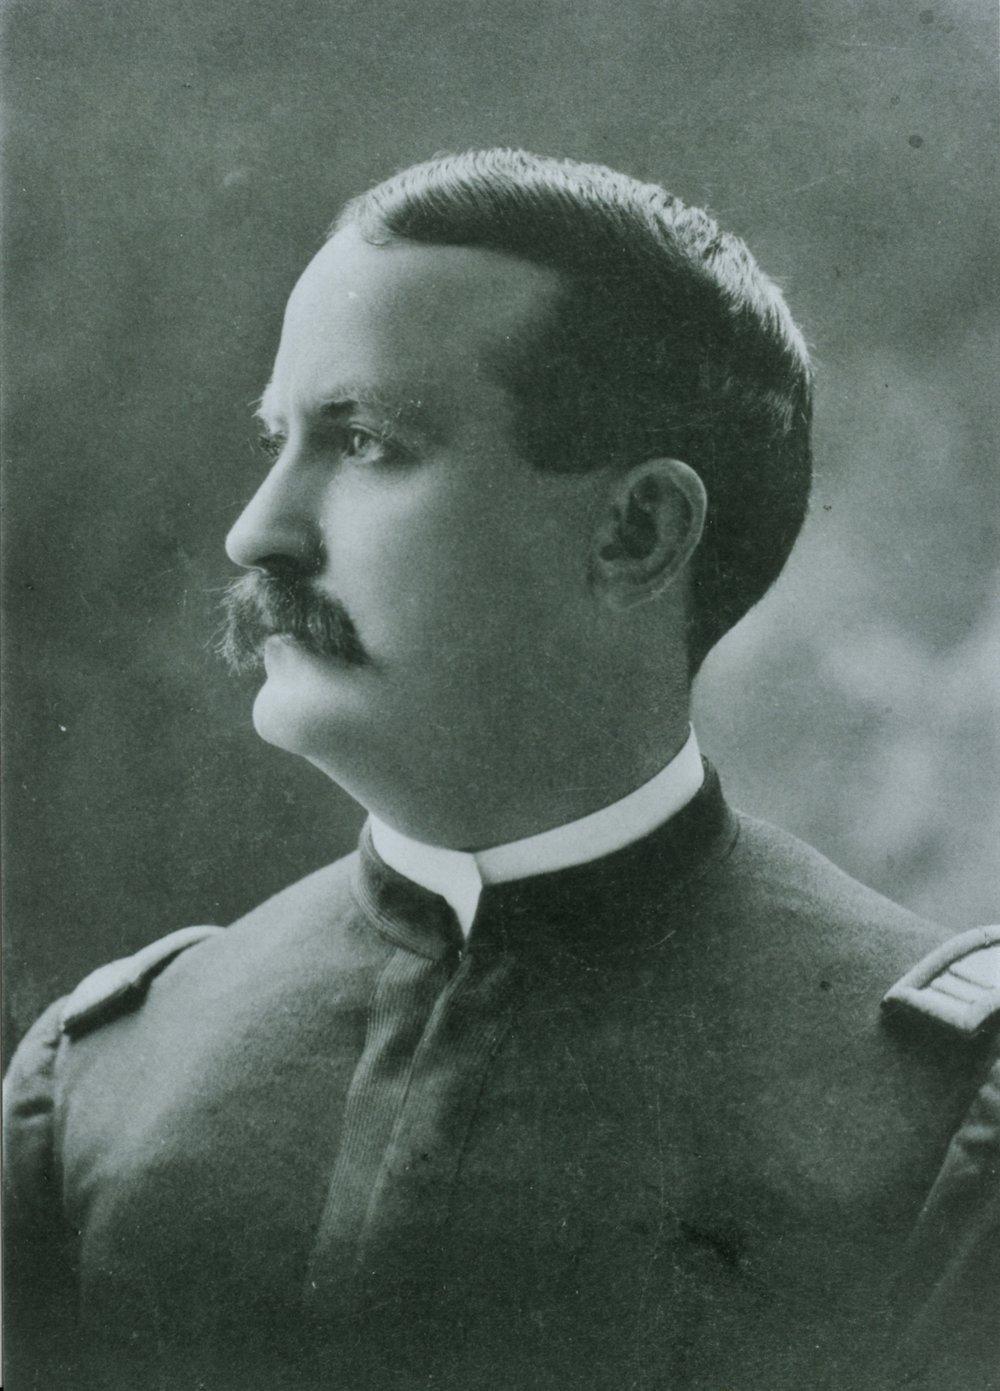 Wm. A. Shannon 1857-1924